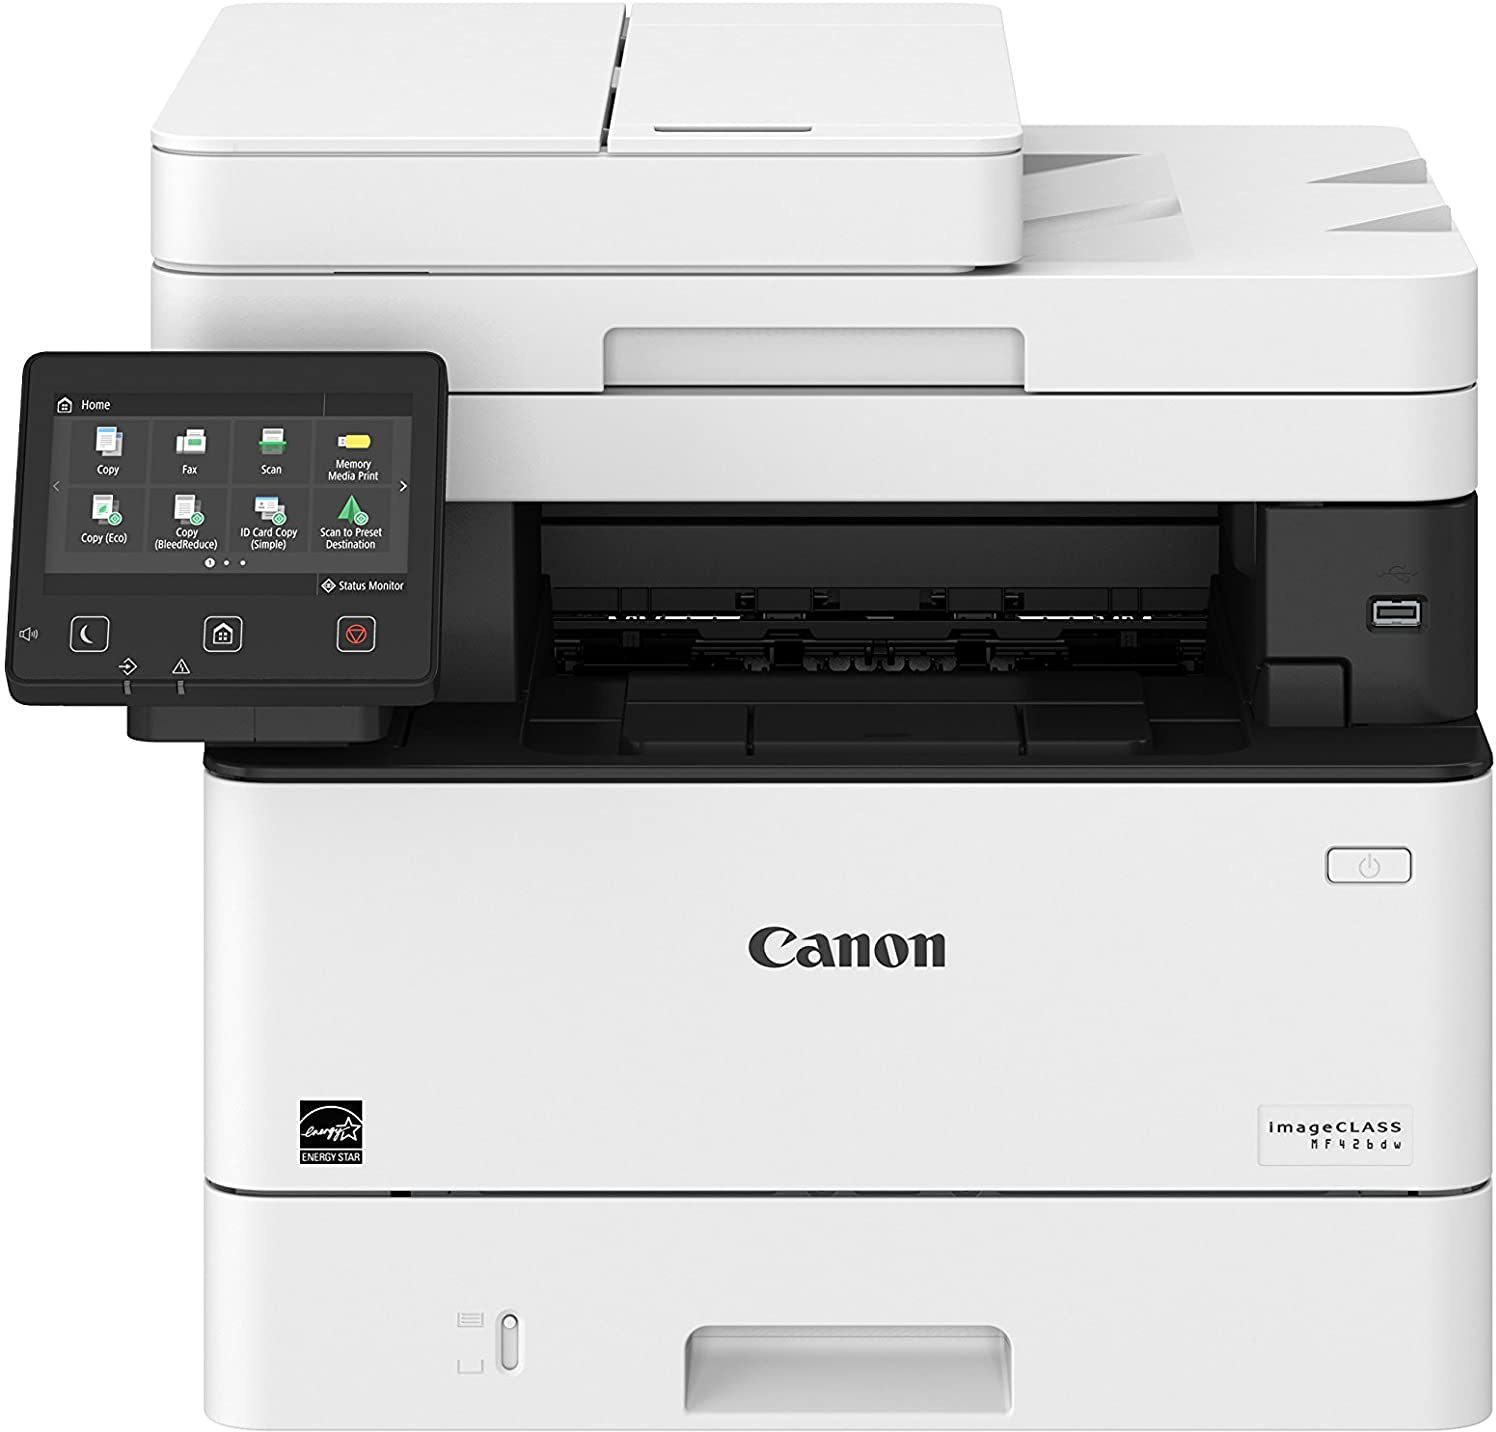 Canon ImageCLASS MF426dw Laser Printer All in One Duplex with WiFi, FAX Multi-function WiFi Color Printer (White, Toner Cartridge)